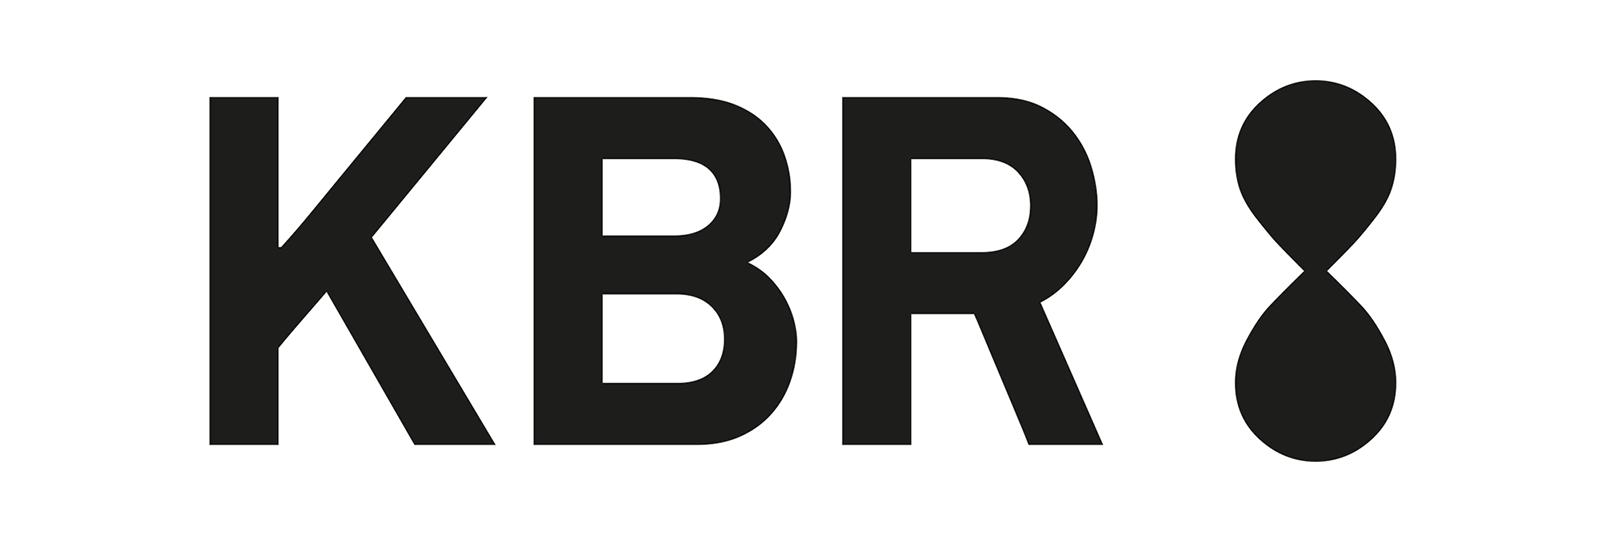 KBR比利时皇家图书馆启用全新的品牌VI形象设计-深圳VI设计3